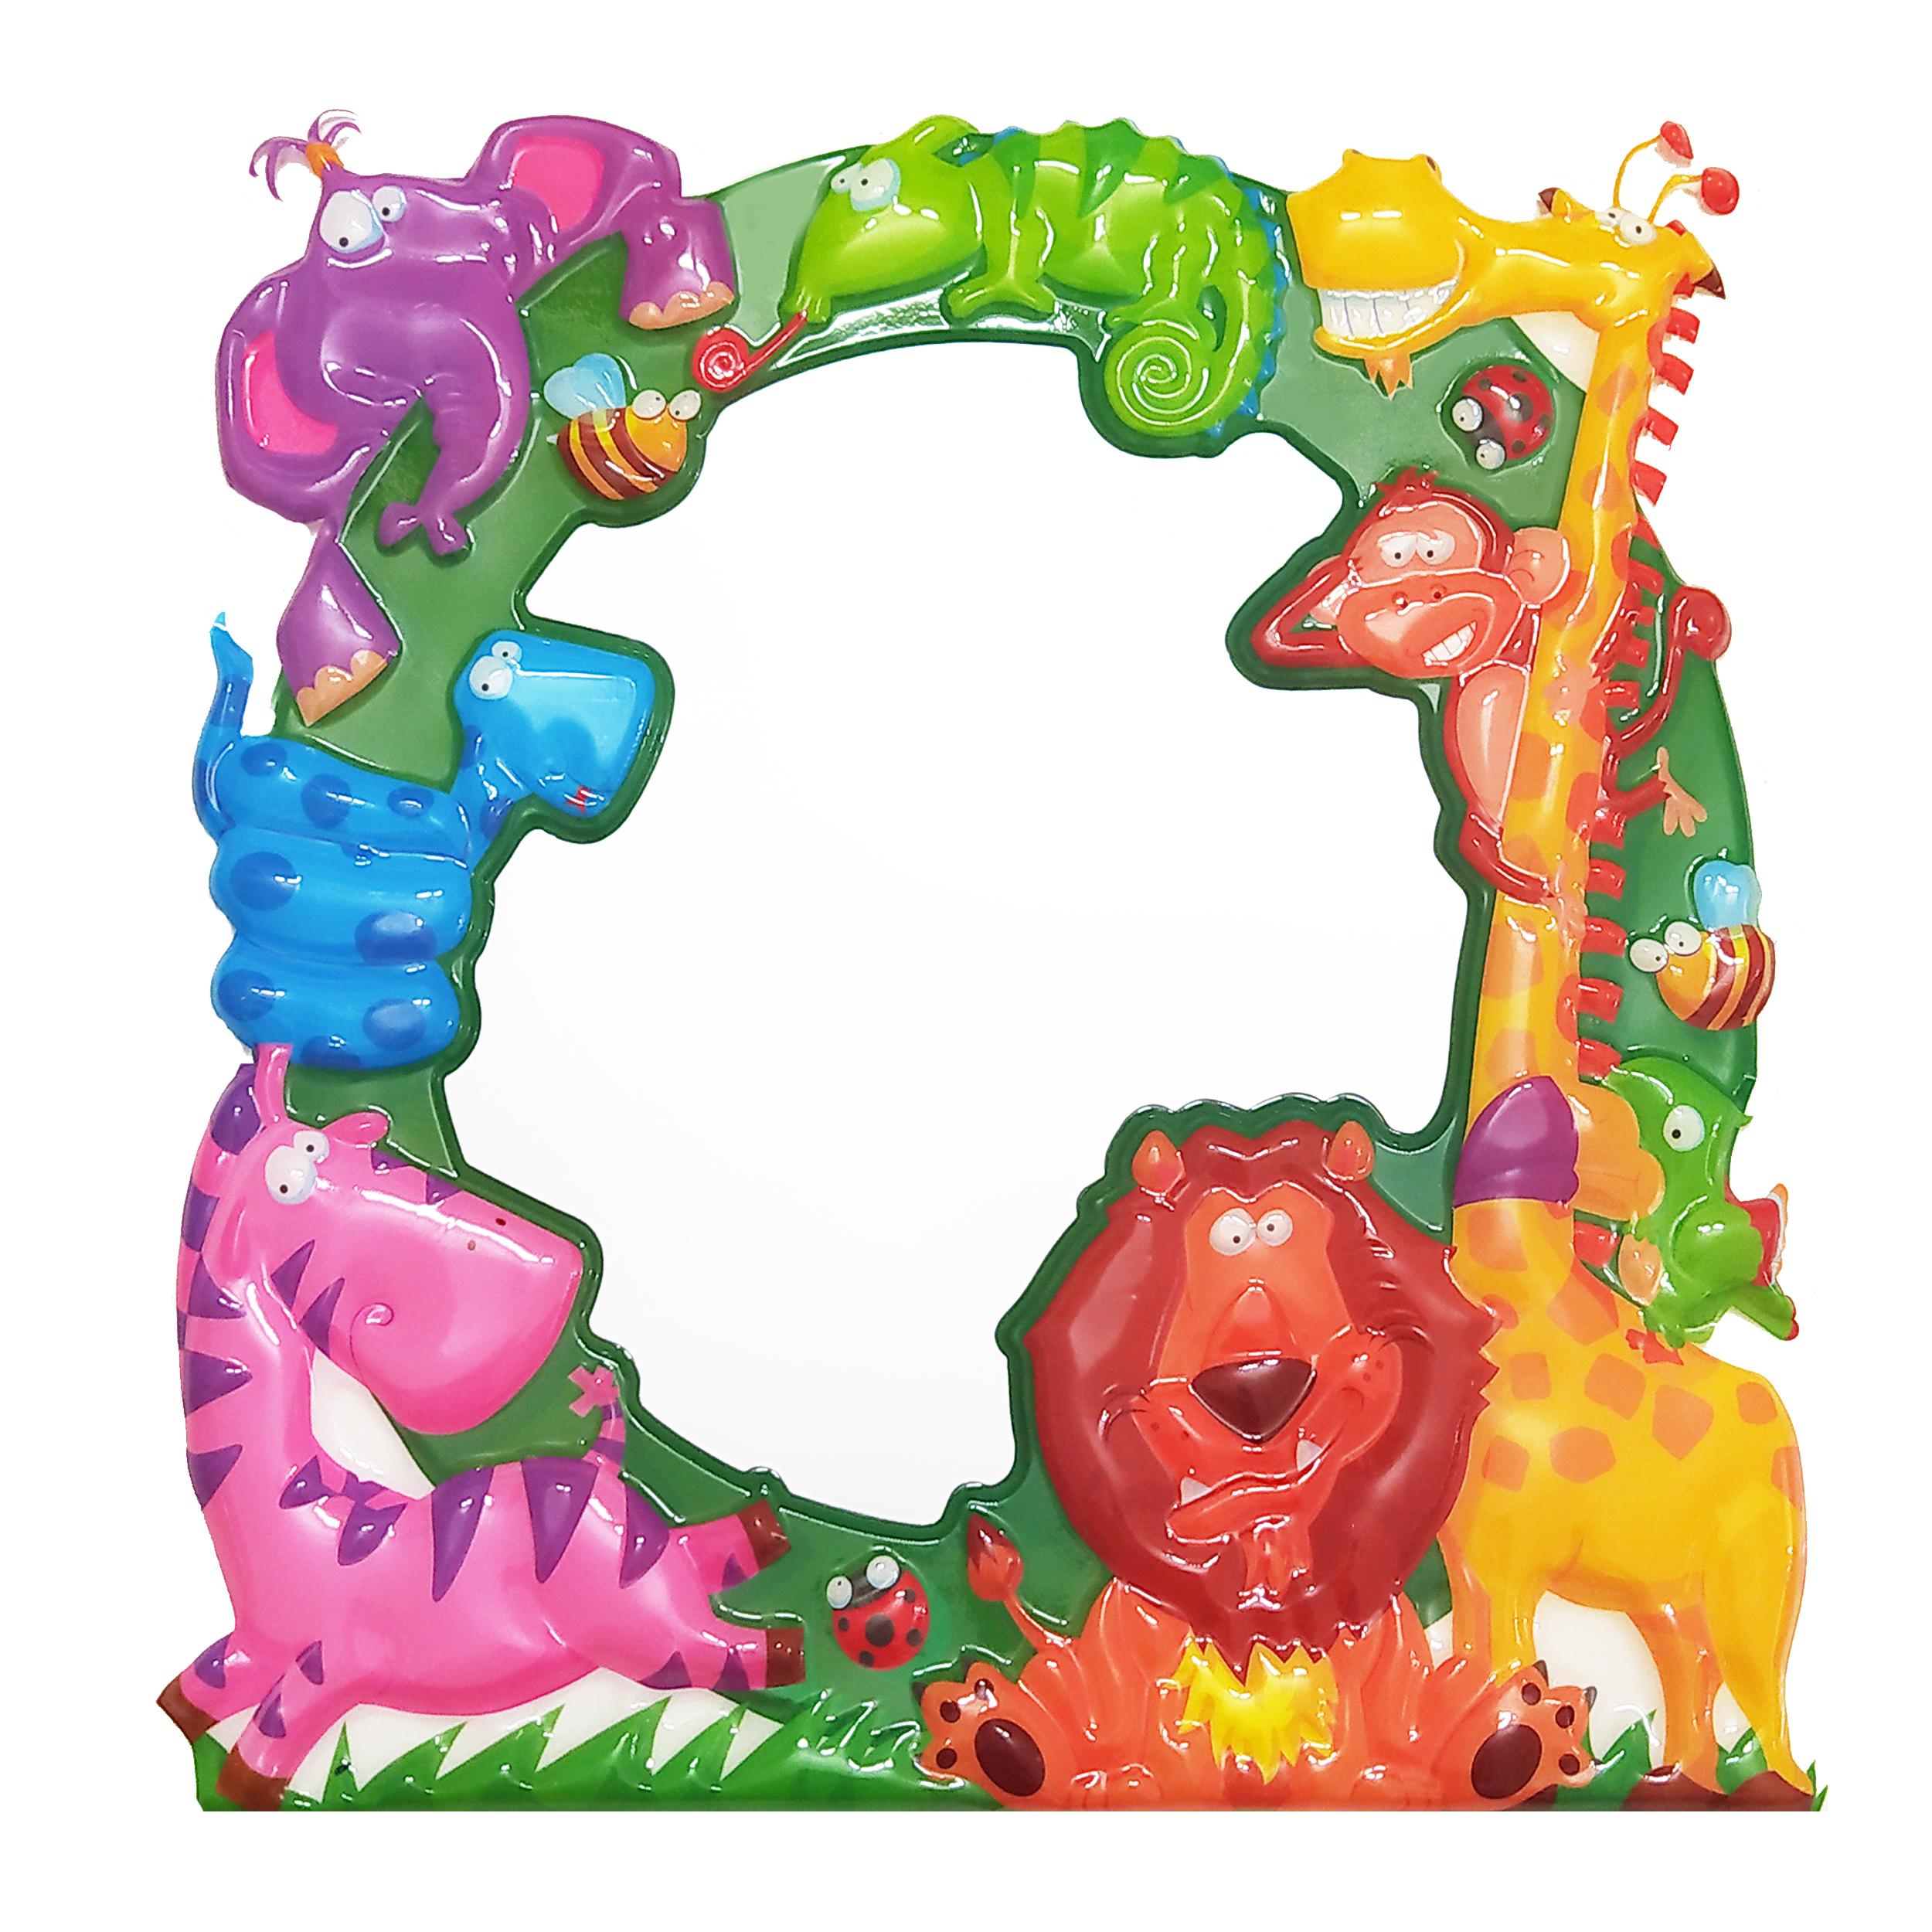 استیکر اتاق کودک طرح حیوانات کد 45